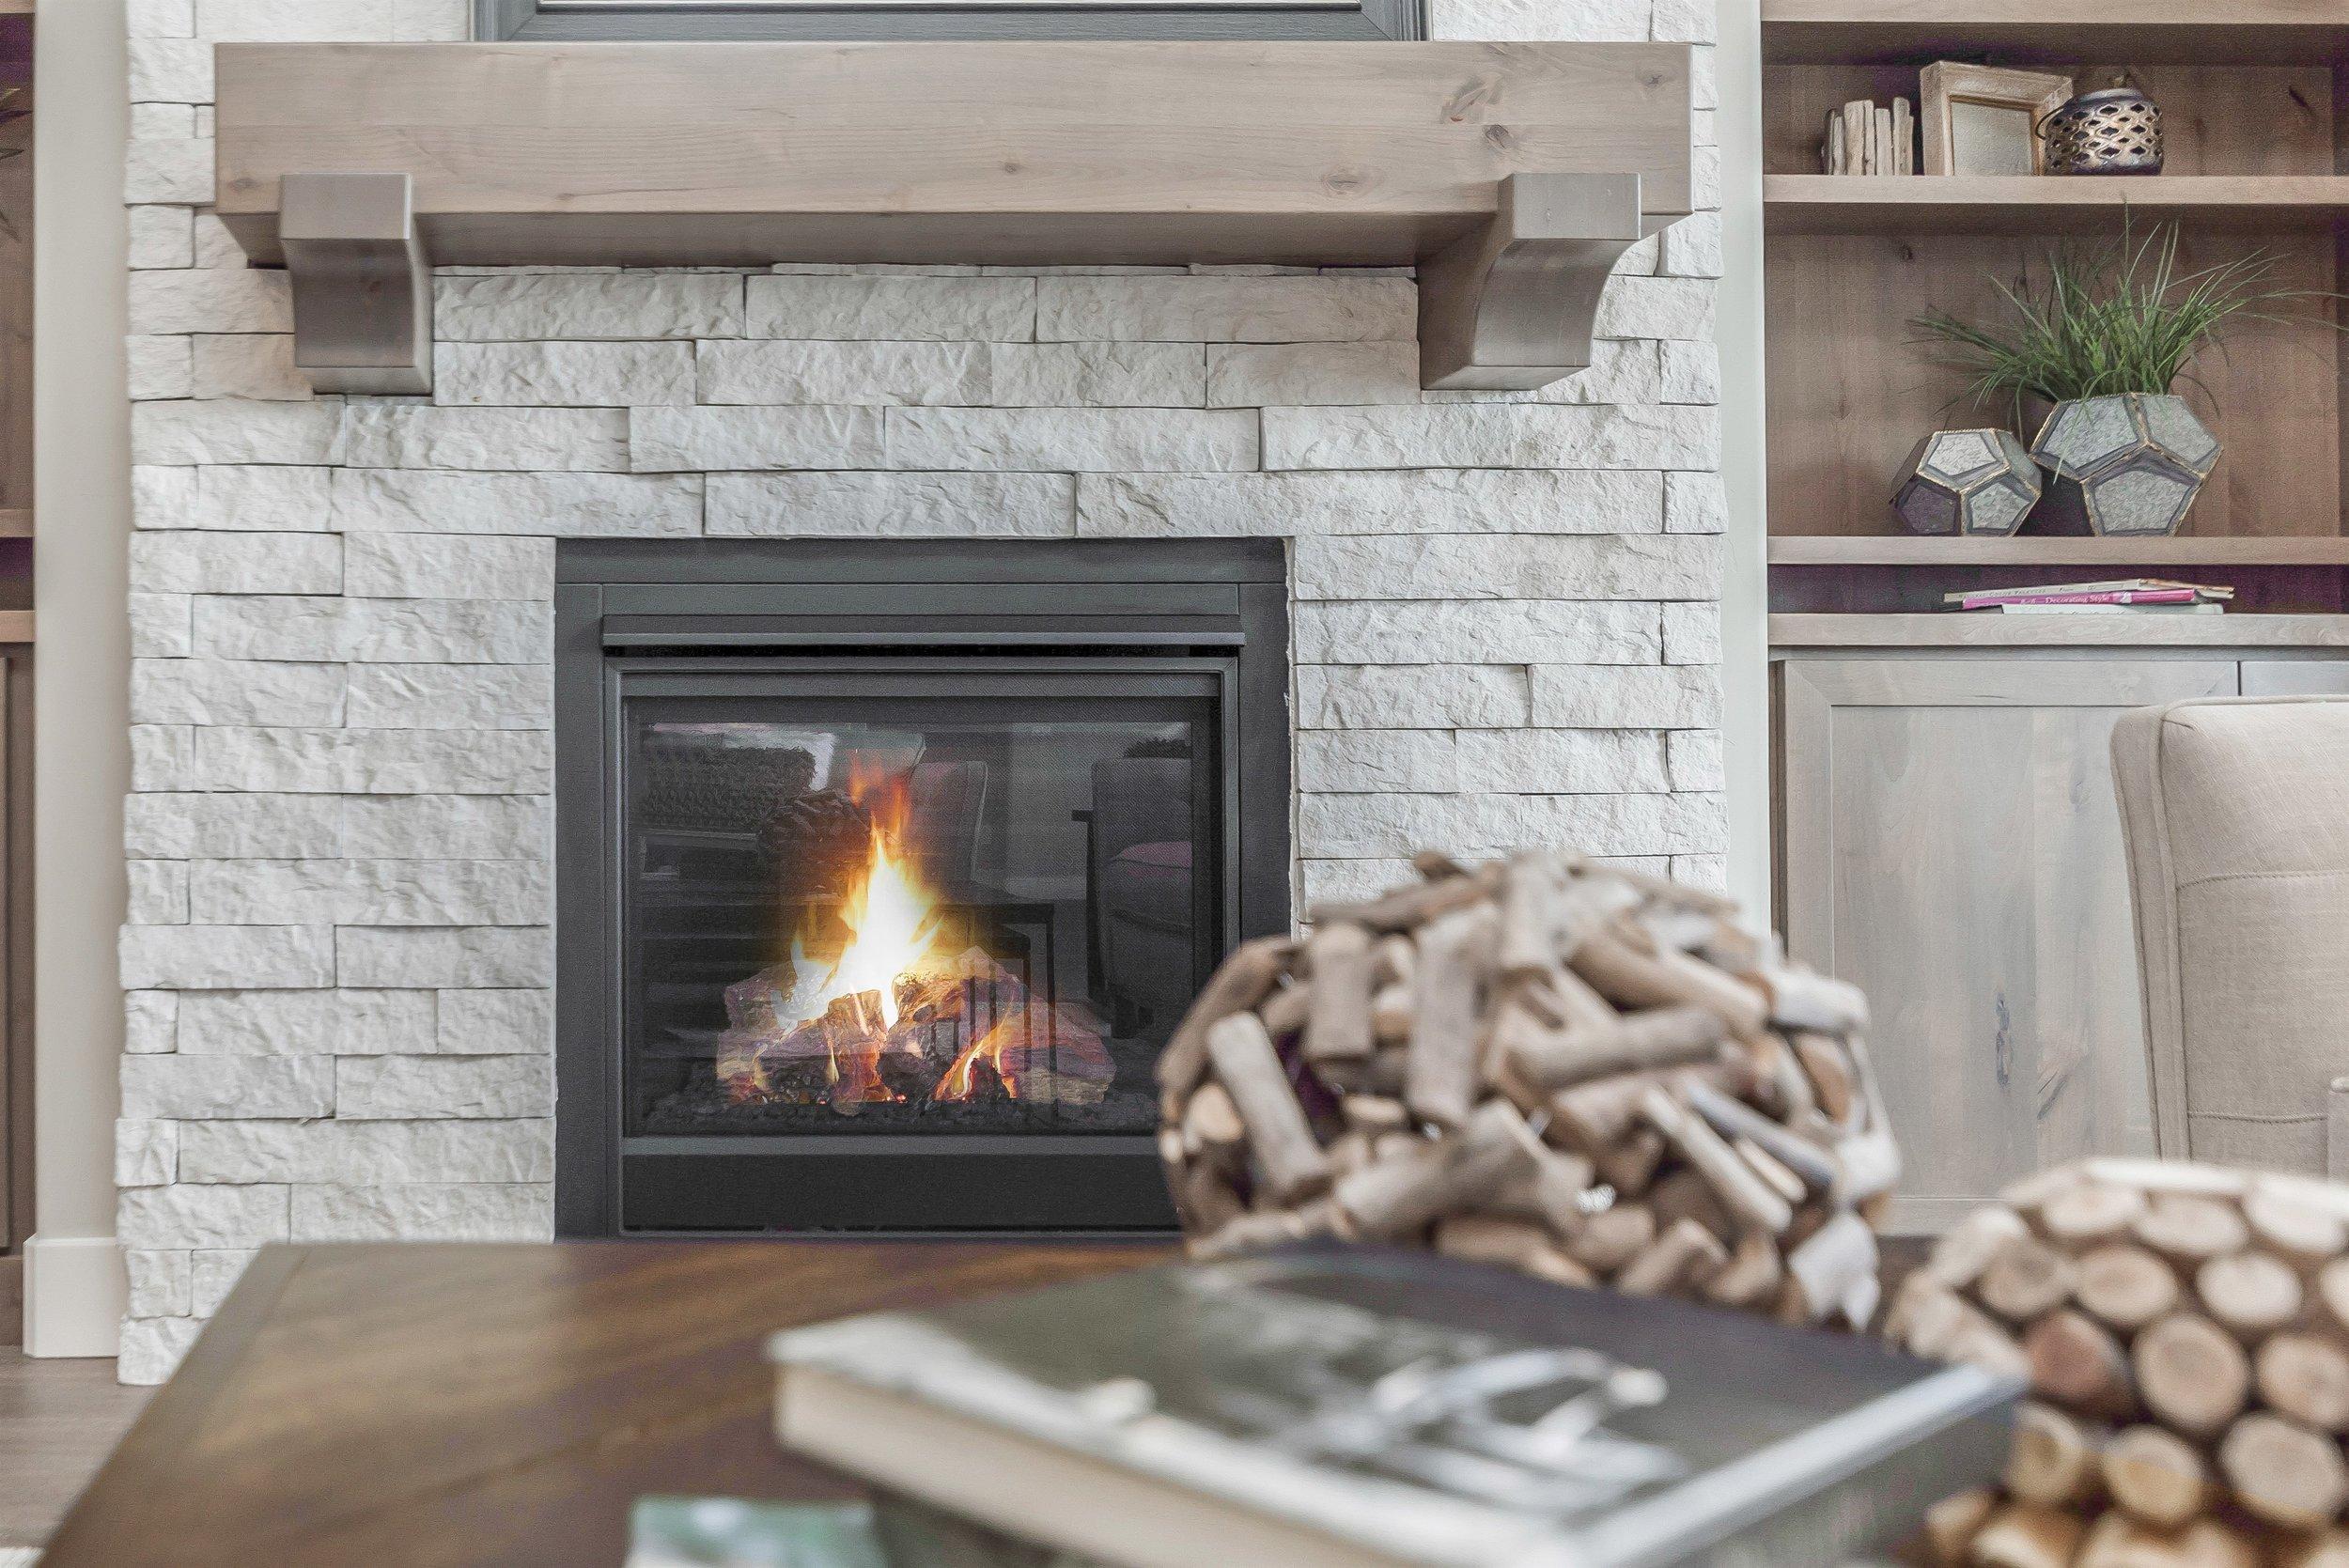 015_Fireplace.jpg